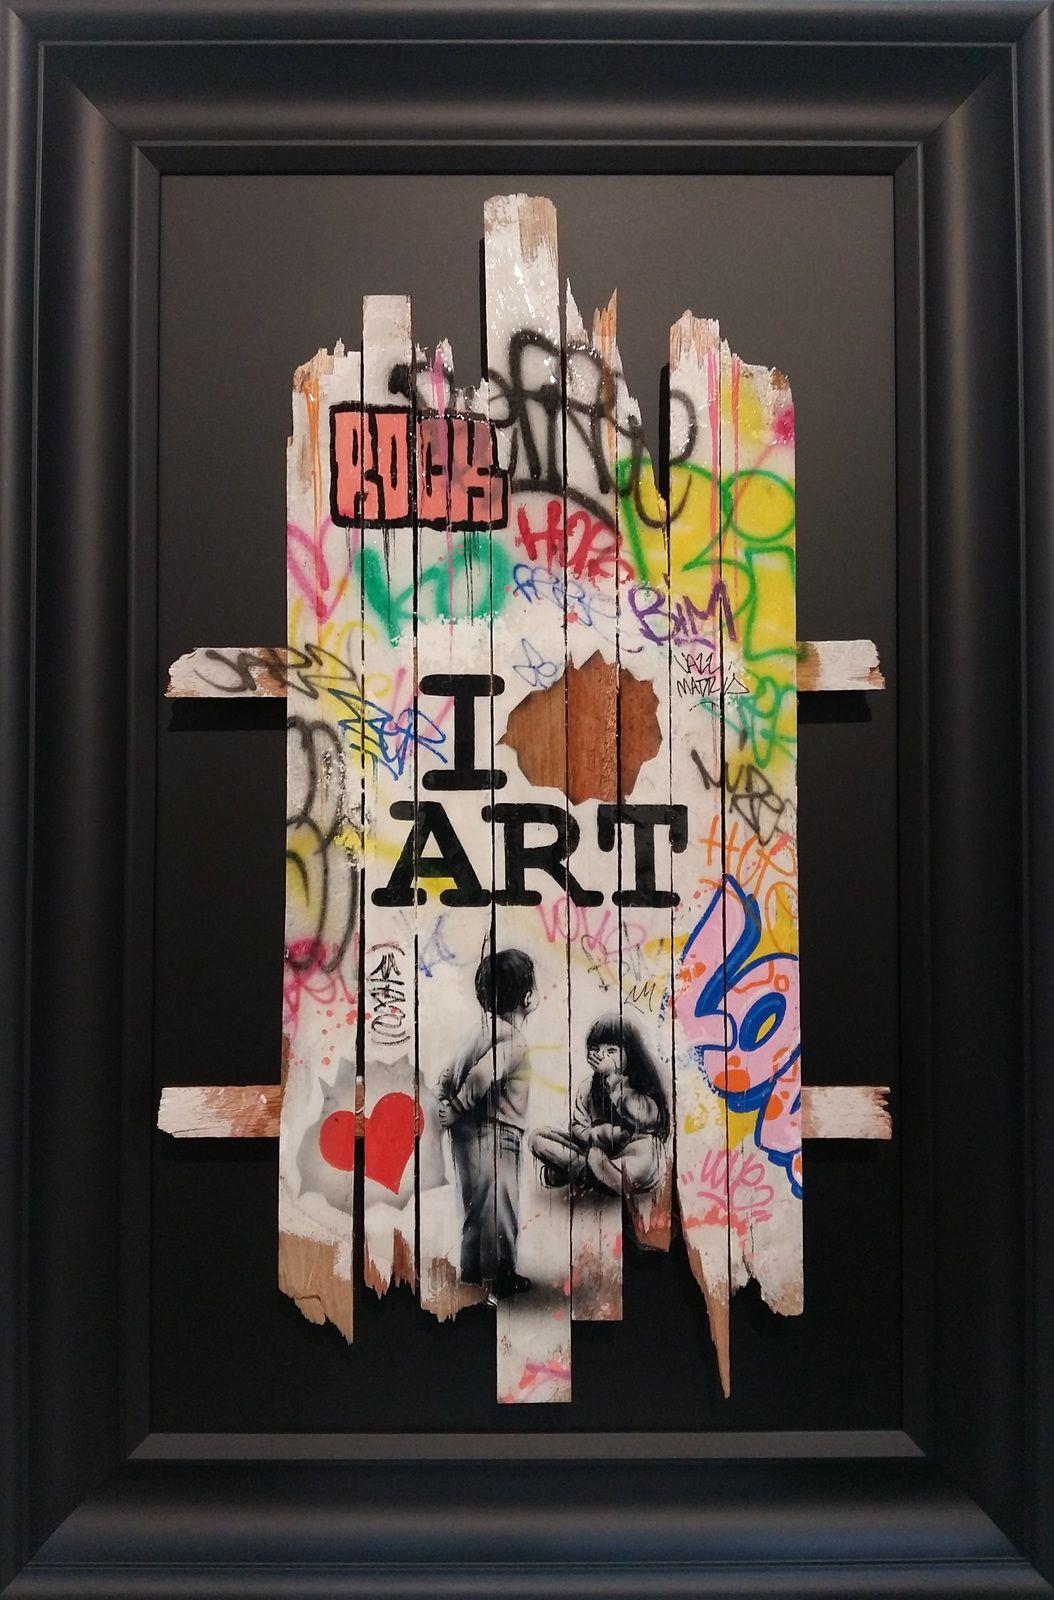 Onemizer I love art galerie artfontainebleau